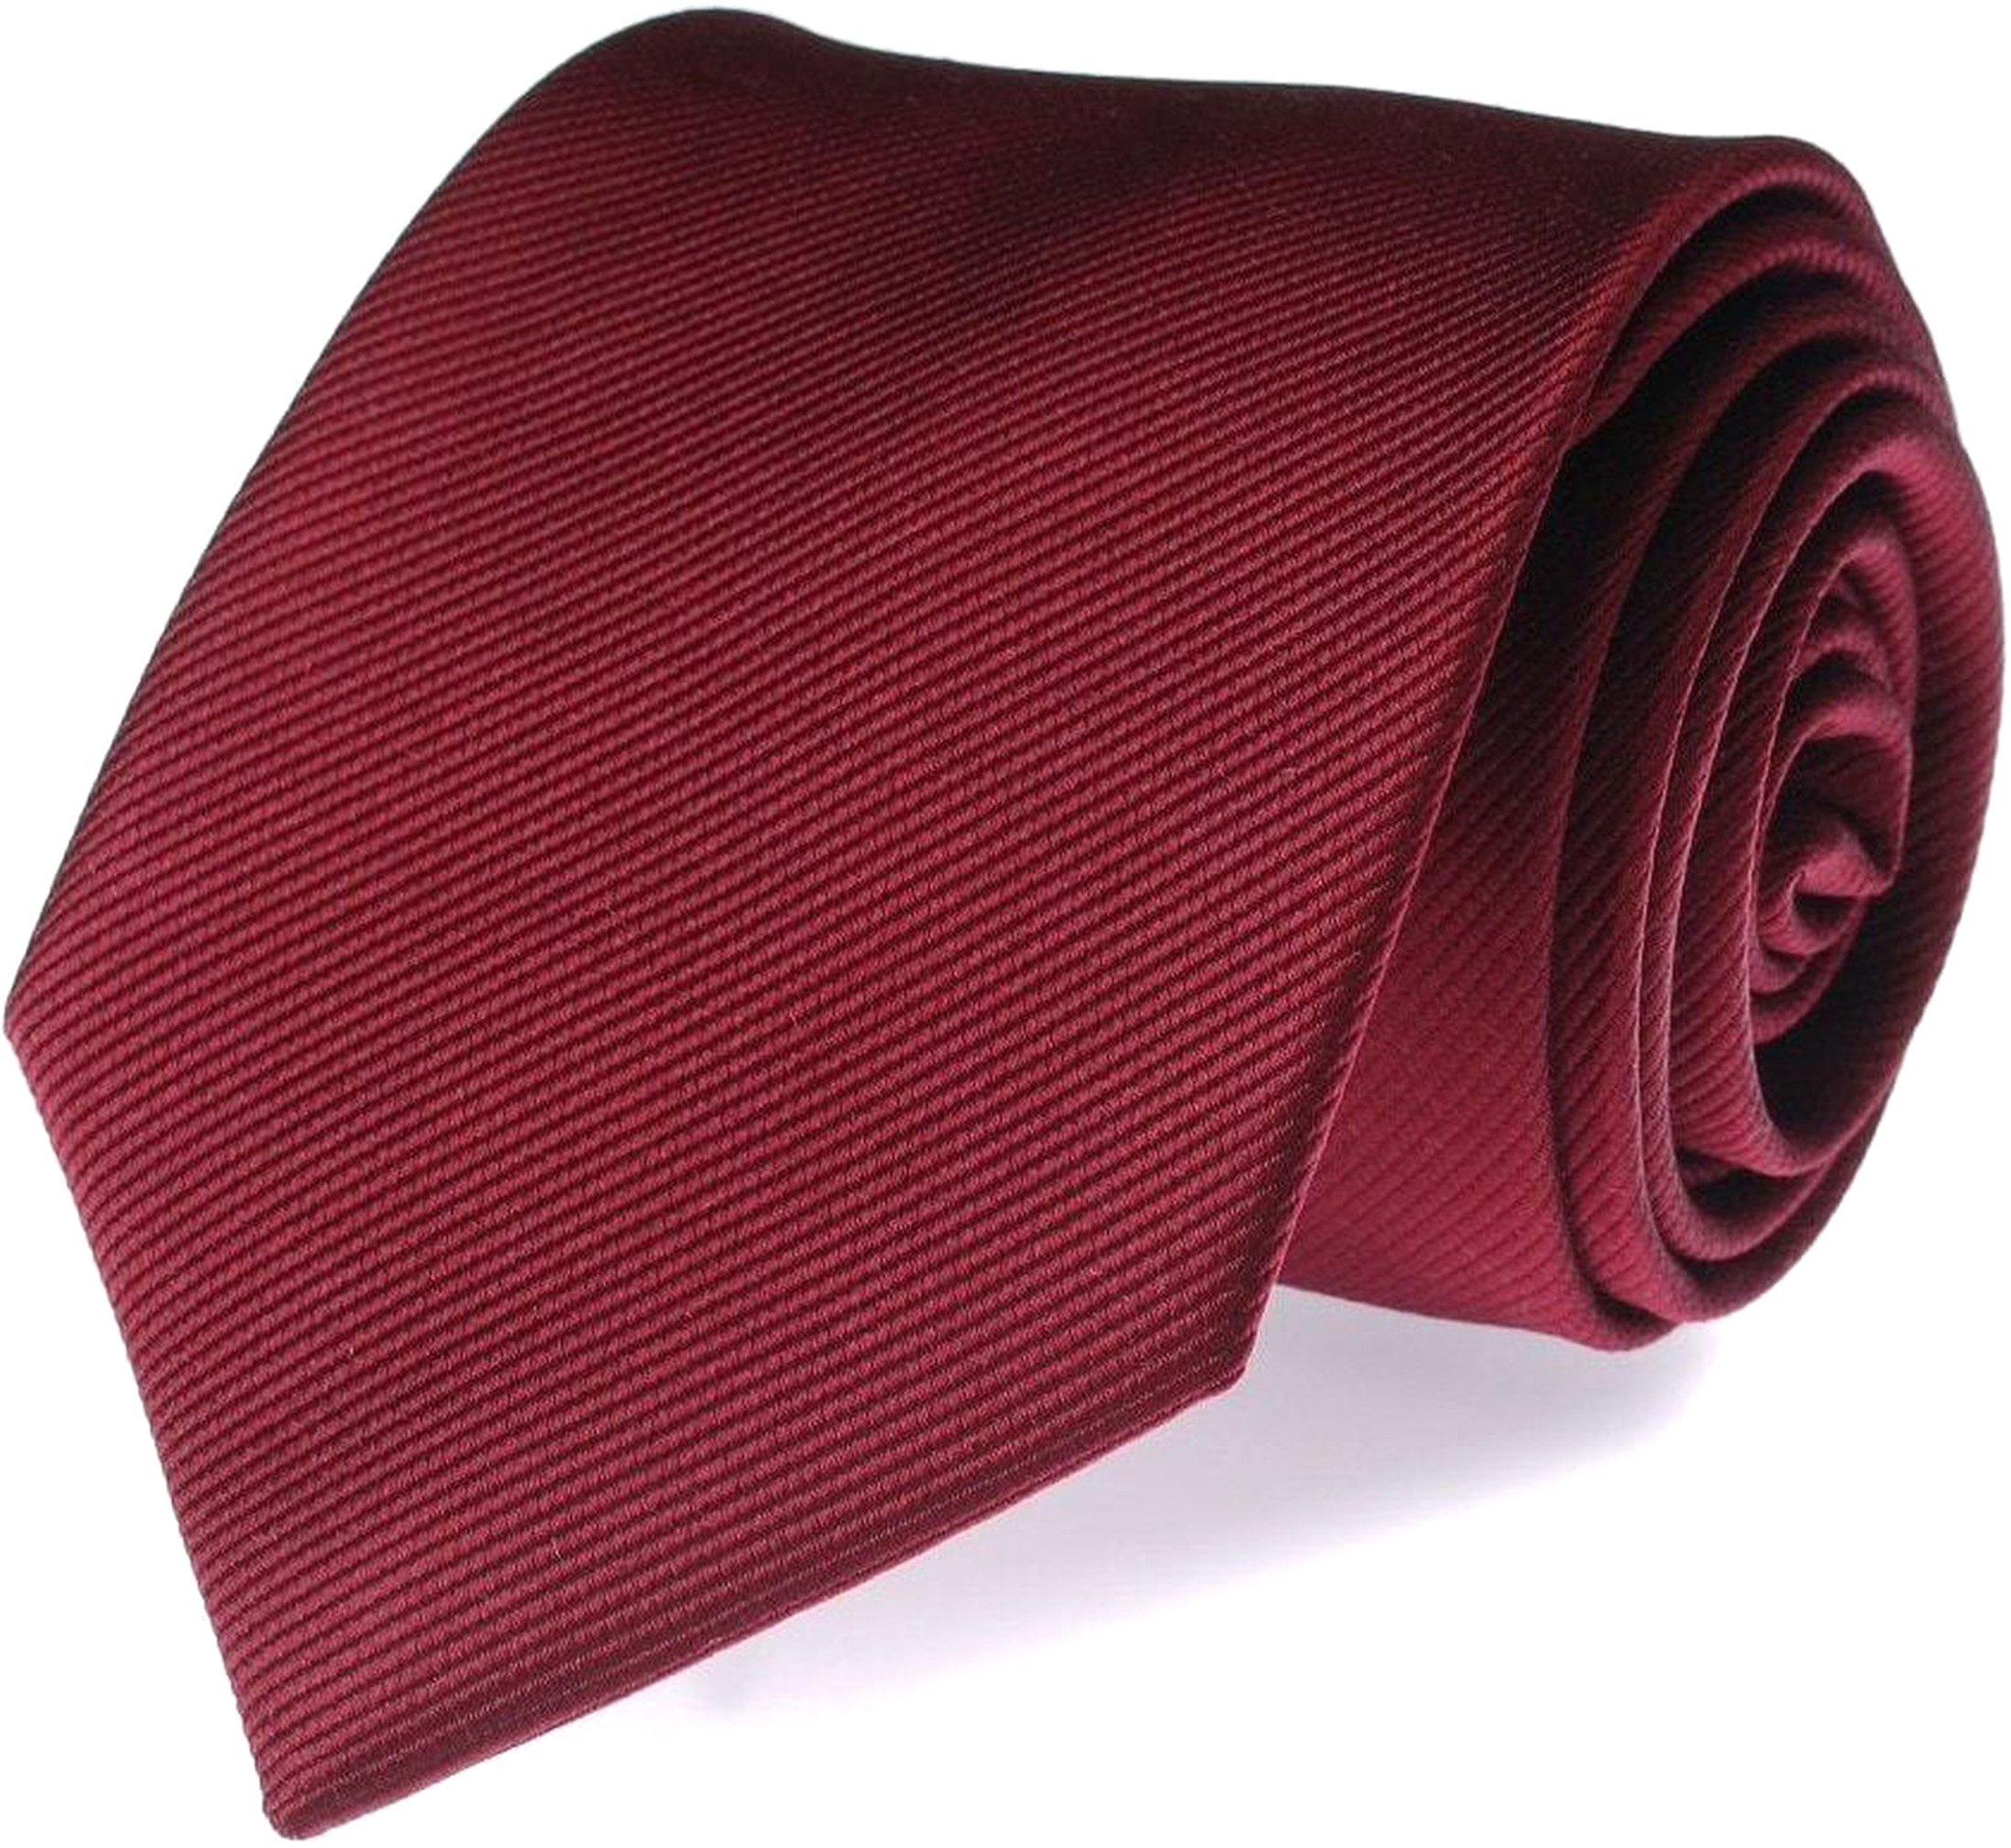 Silk Tie Bordeaux F31 photo 0